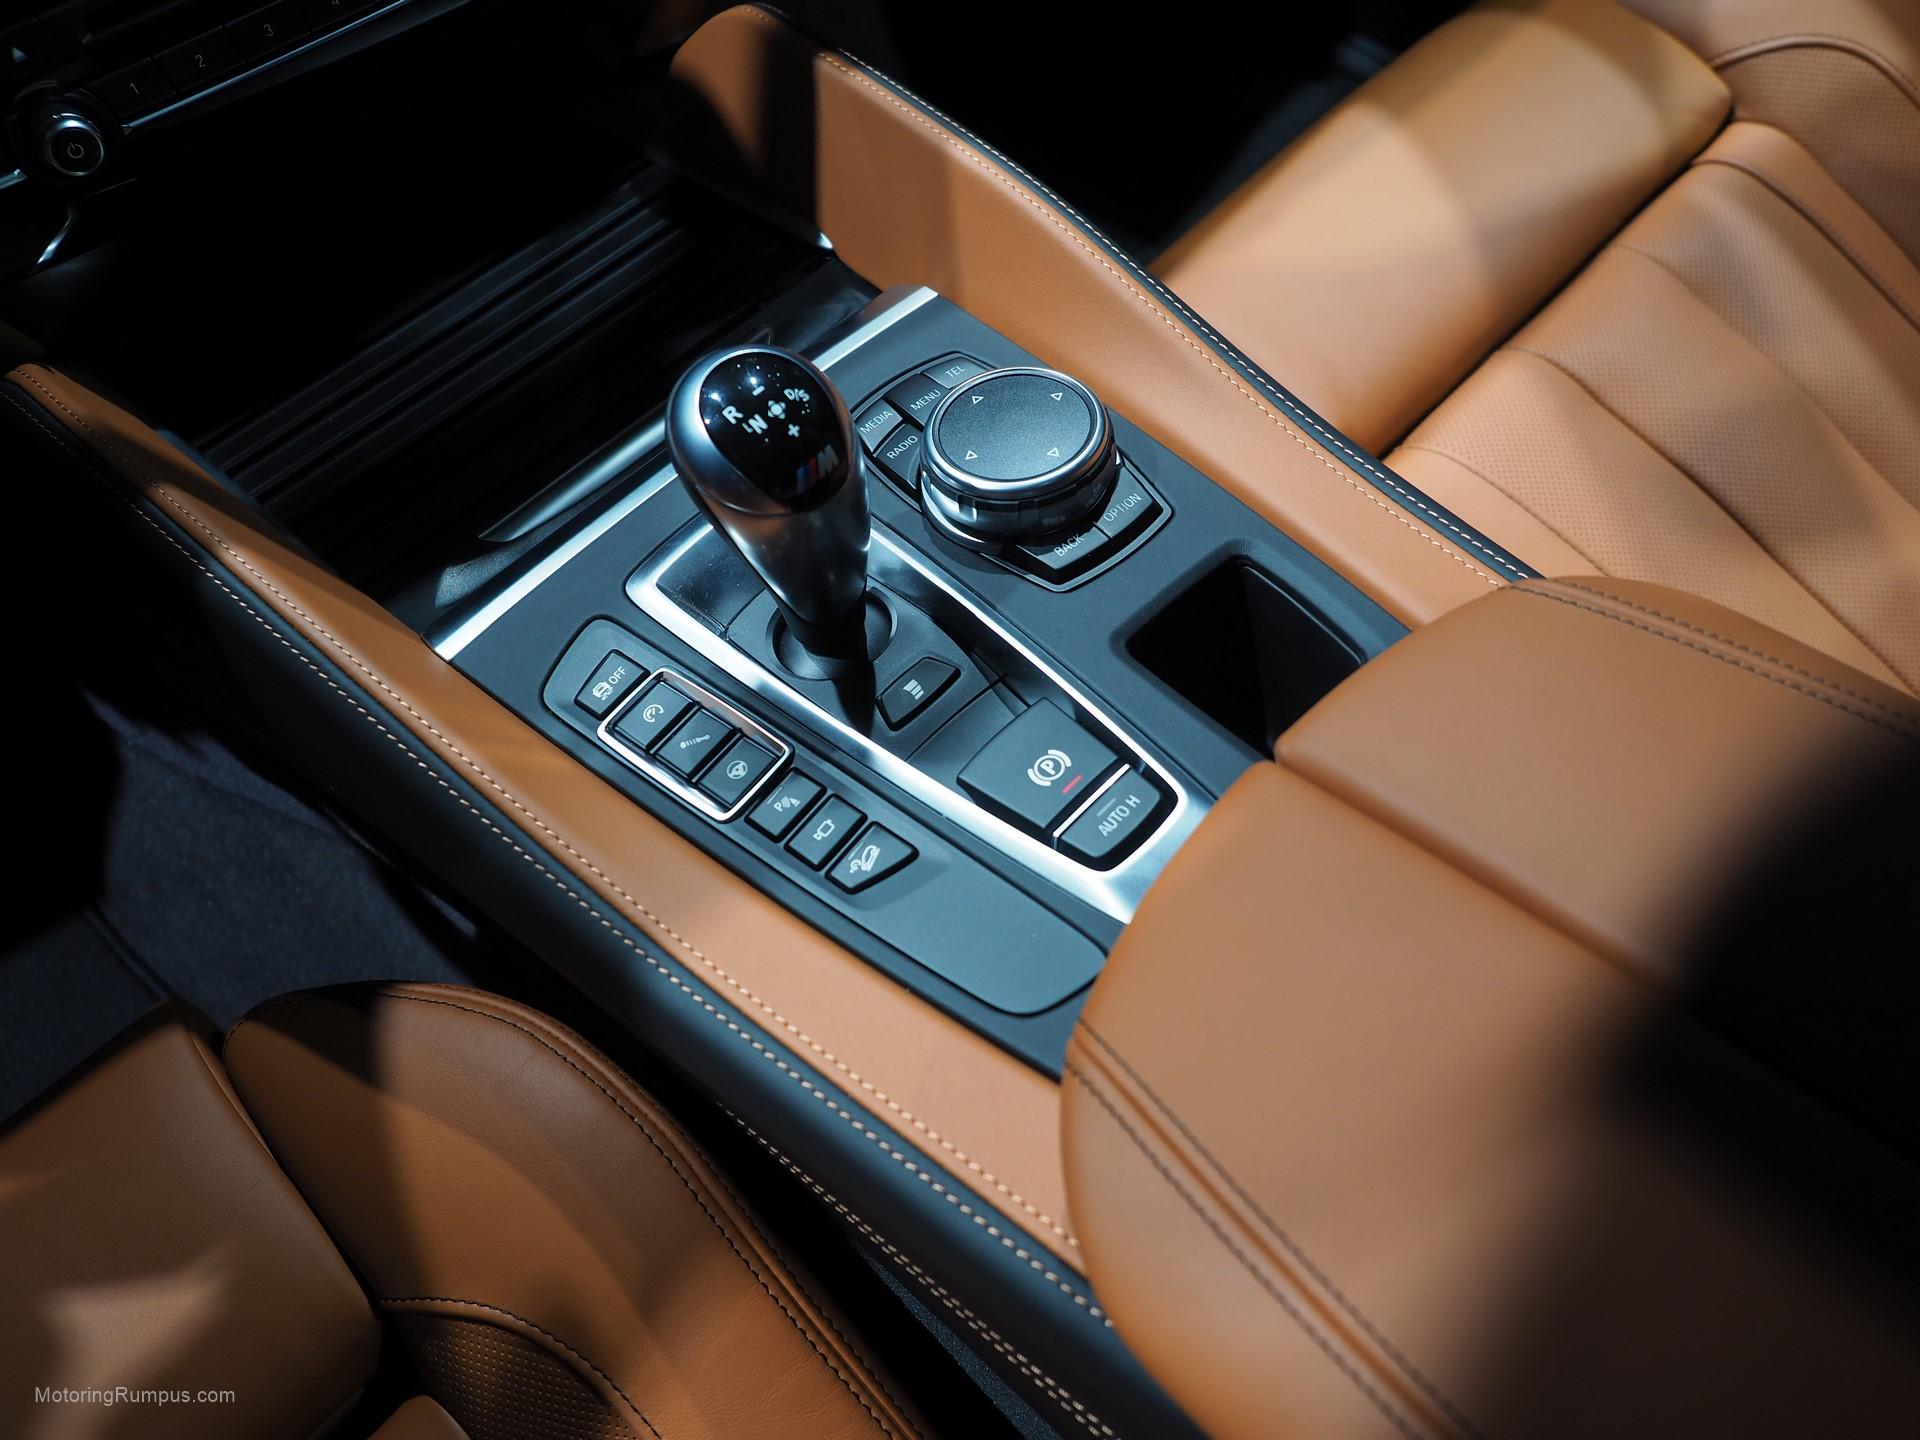 2016 NAIAS BMW X6M Center Console